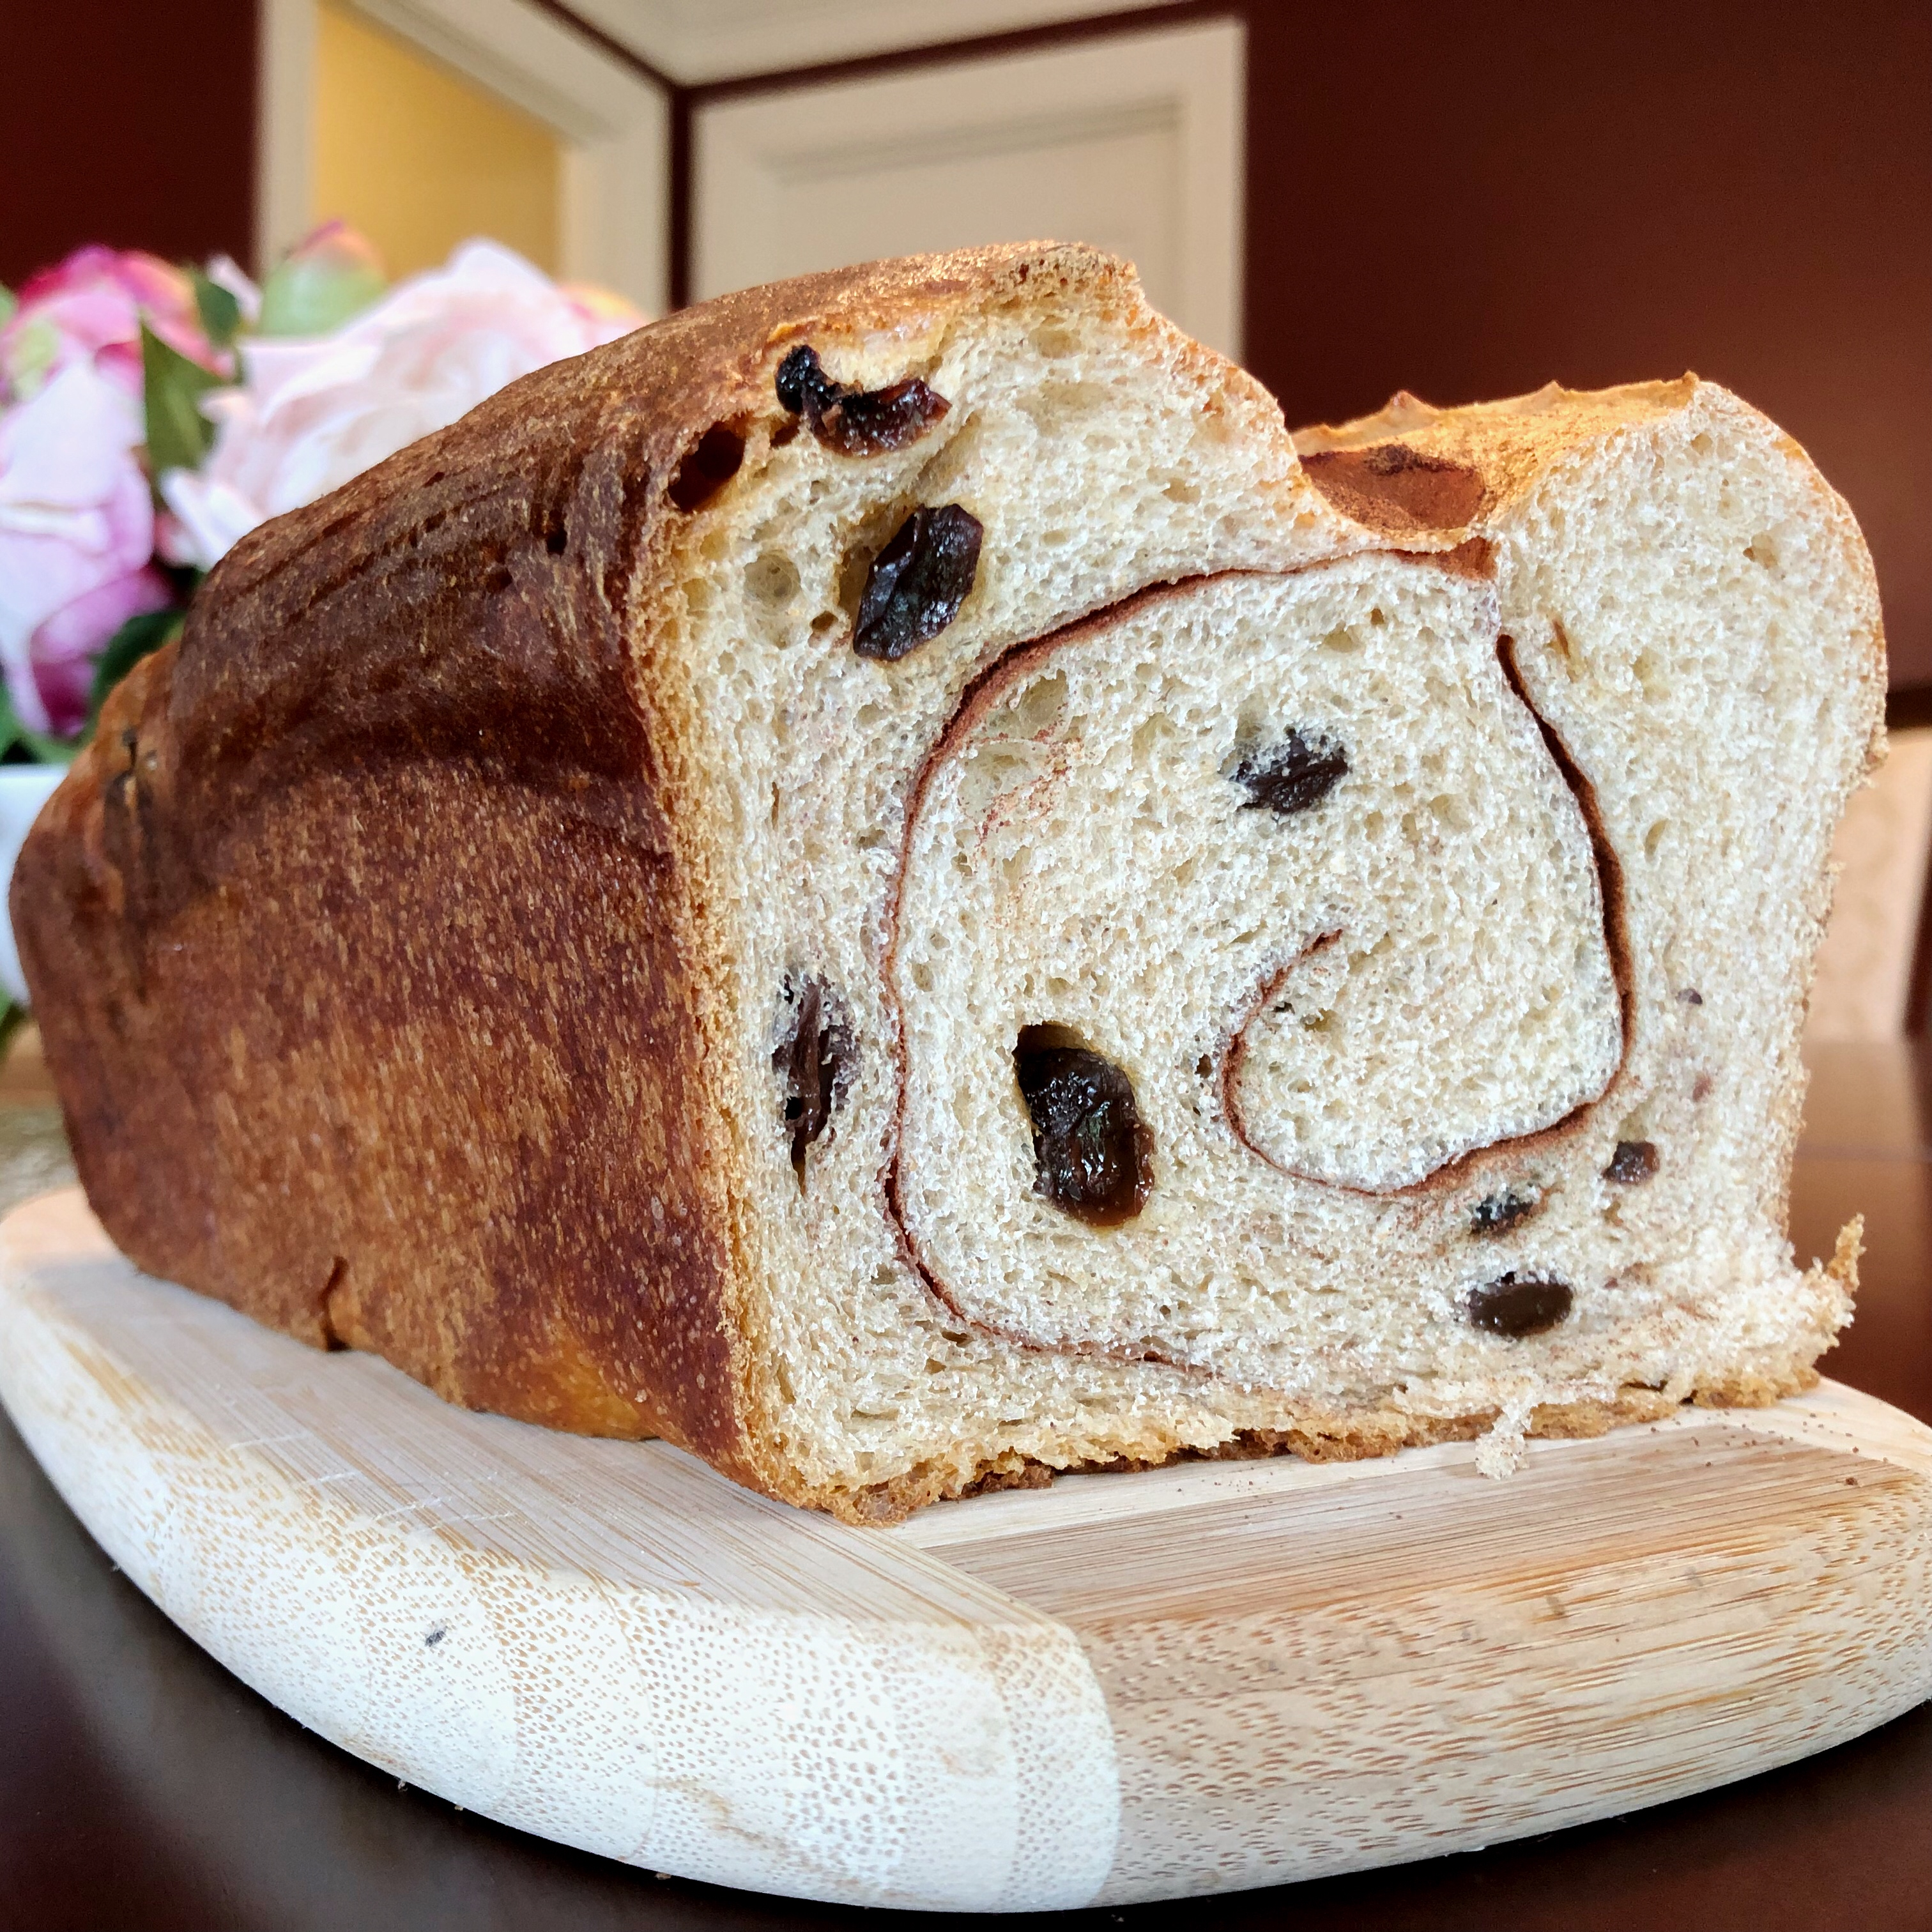 Cinnamon Raisin Swirl Bread via @susanmylovingoven.com